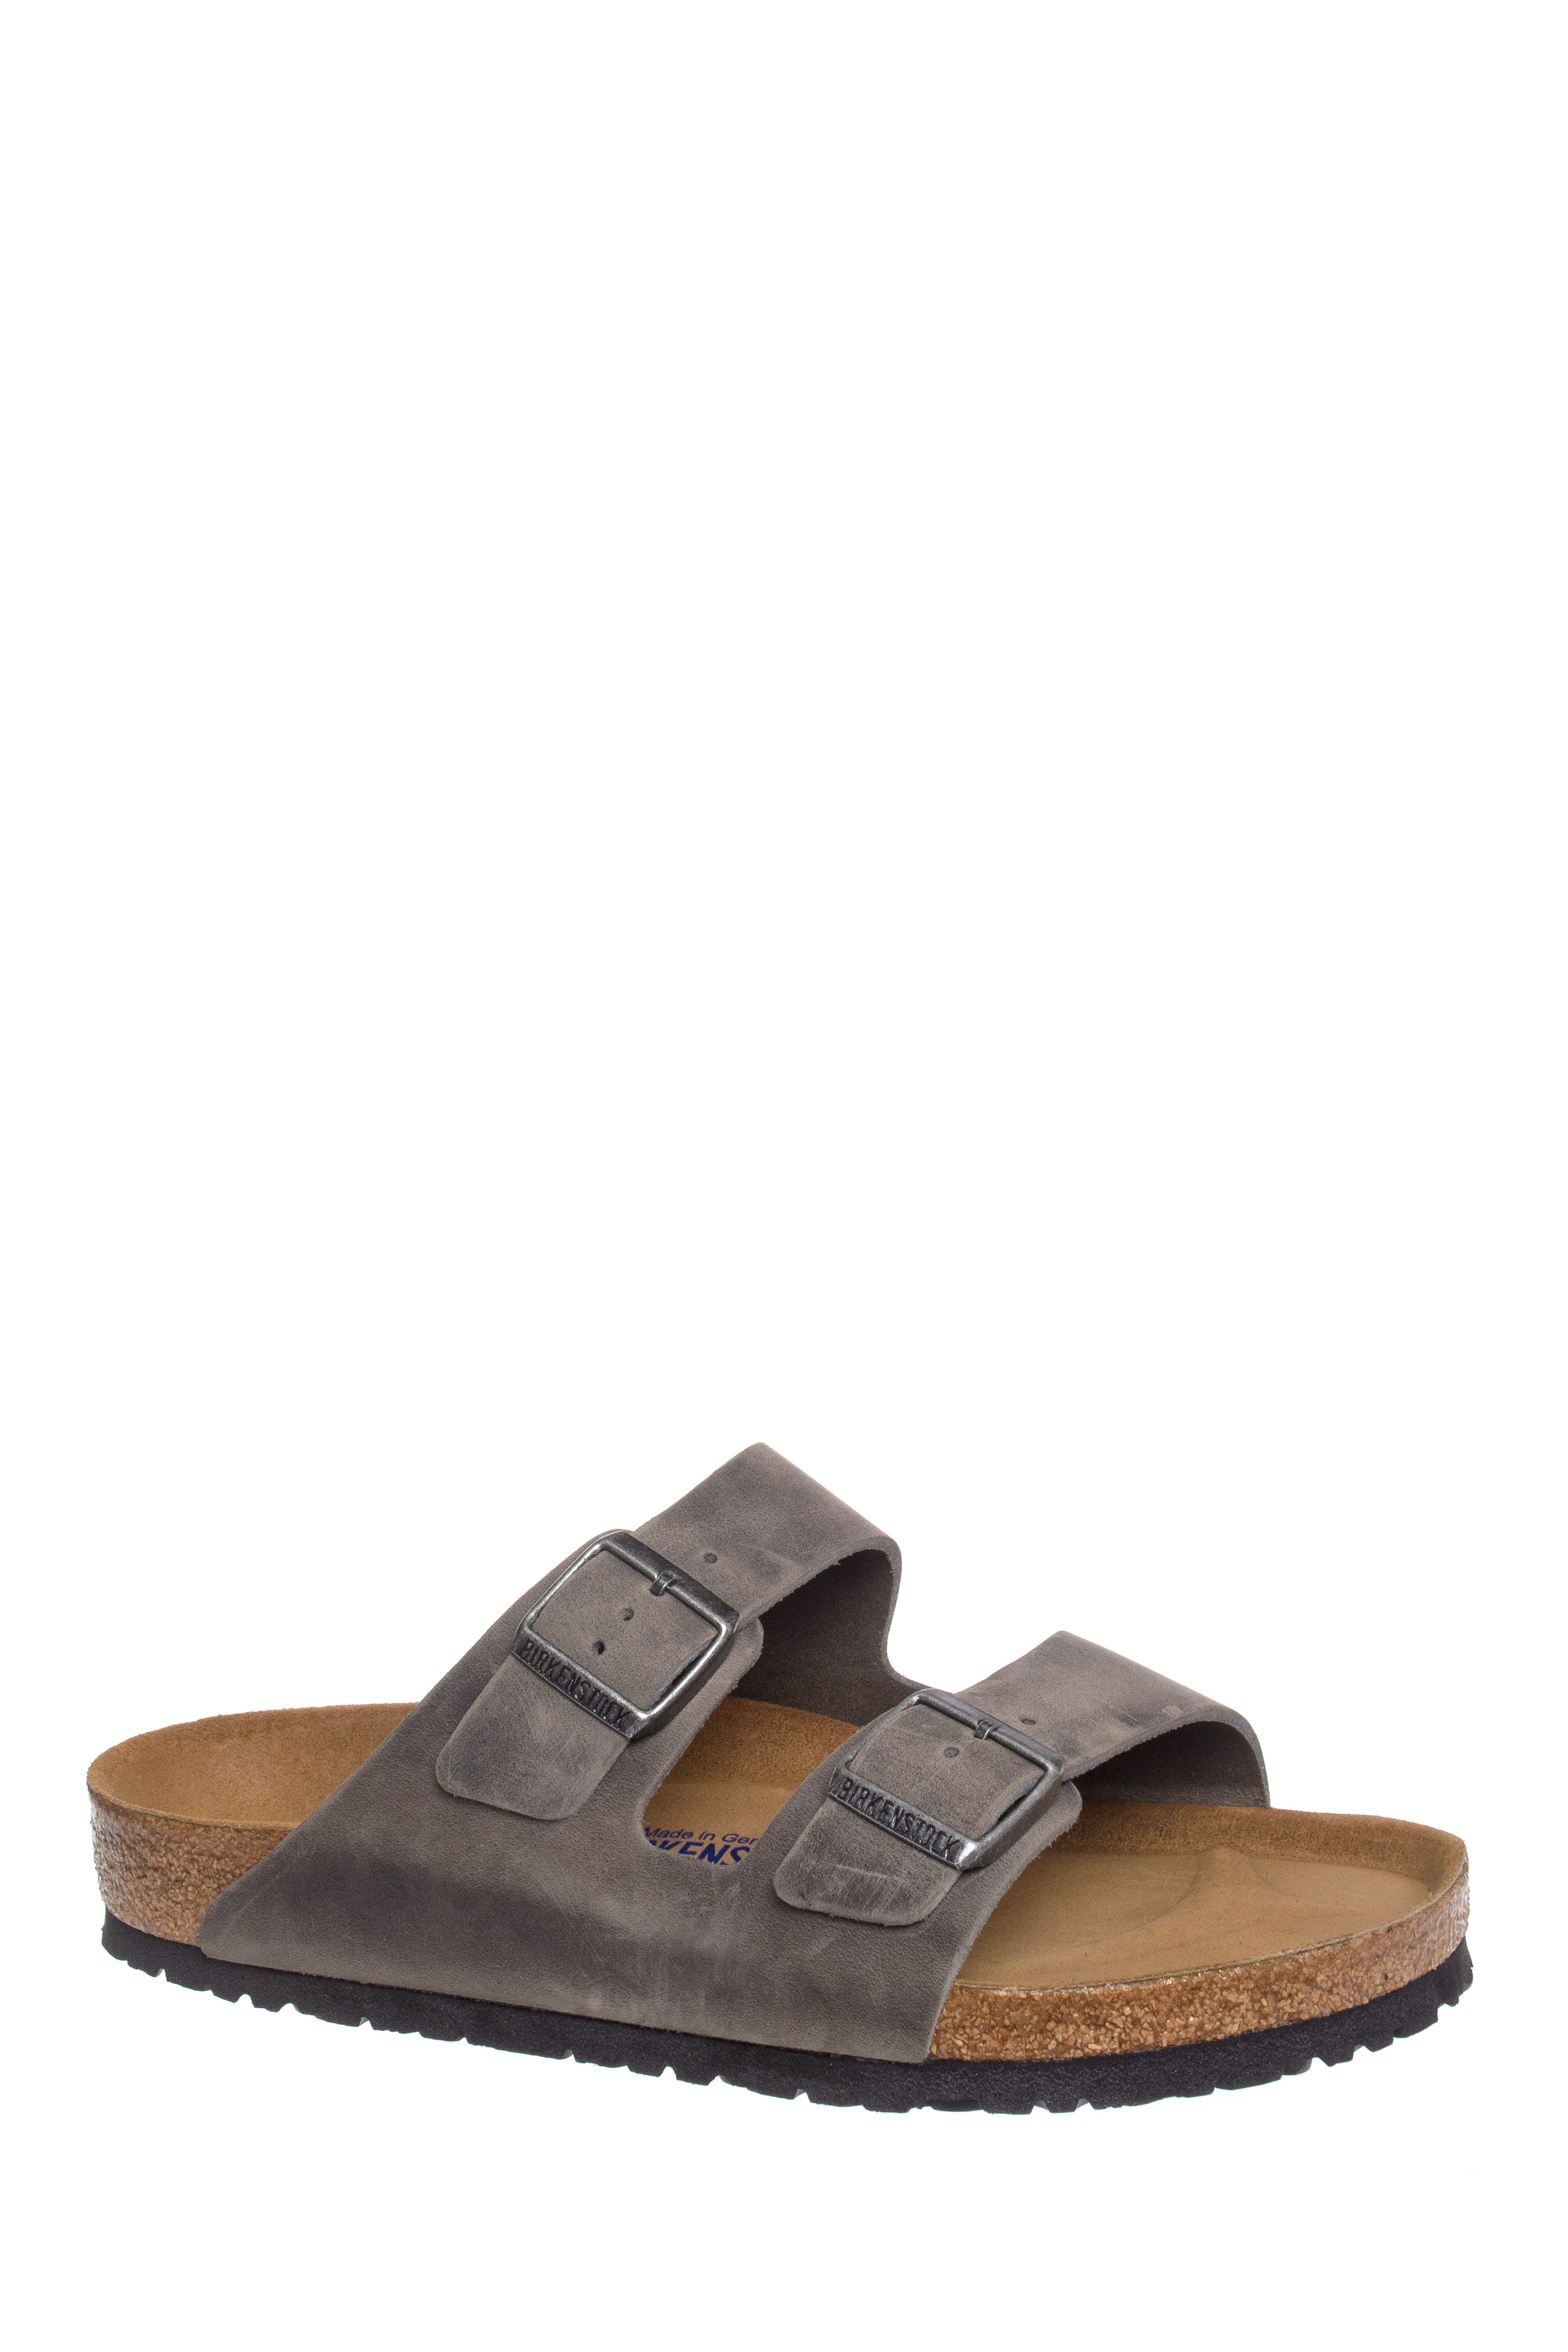 Birkenstock Arizona Slide Sandals - Iron